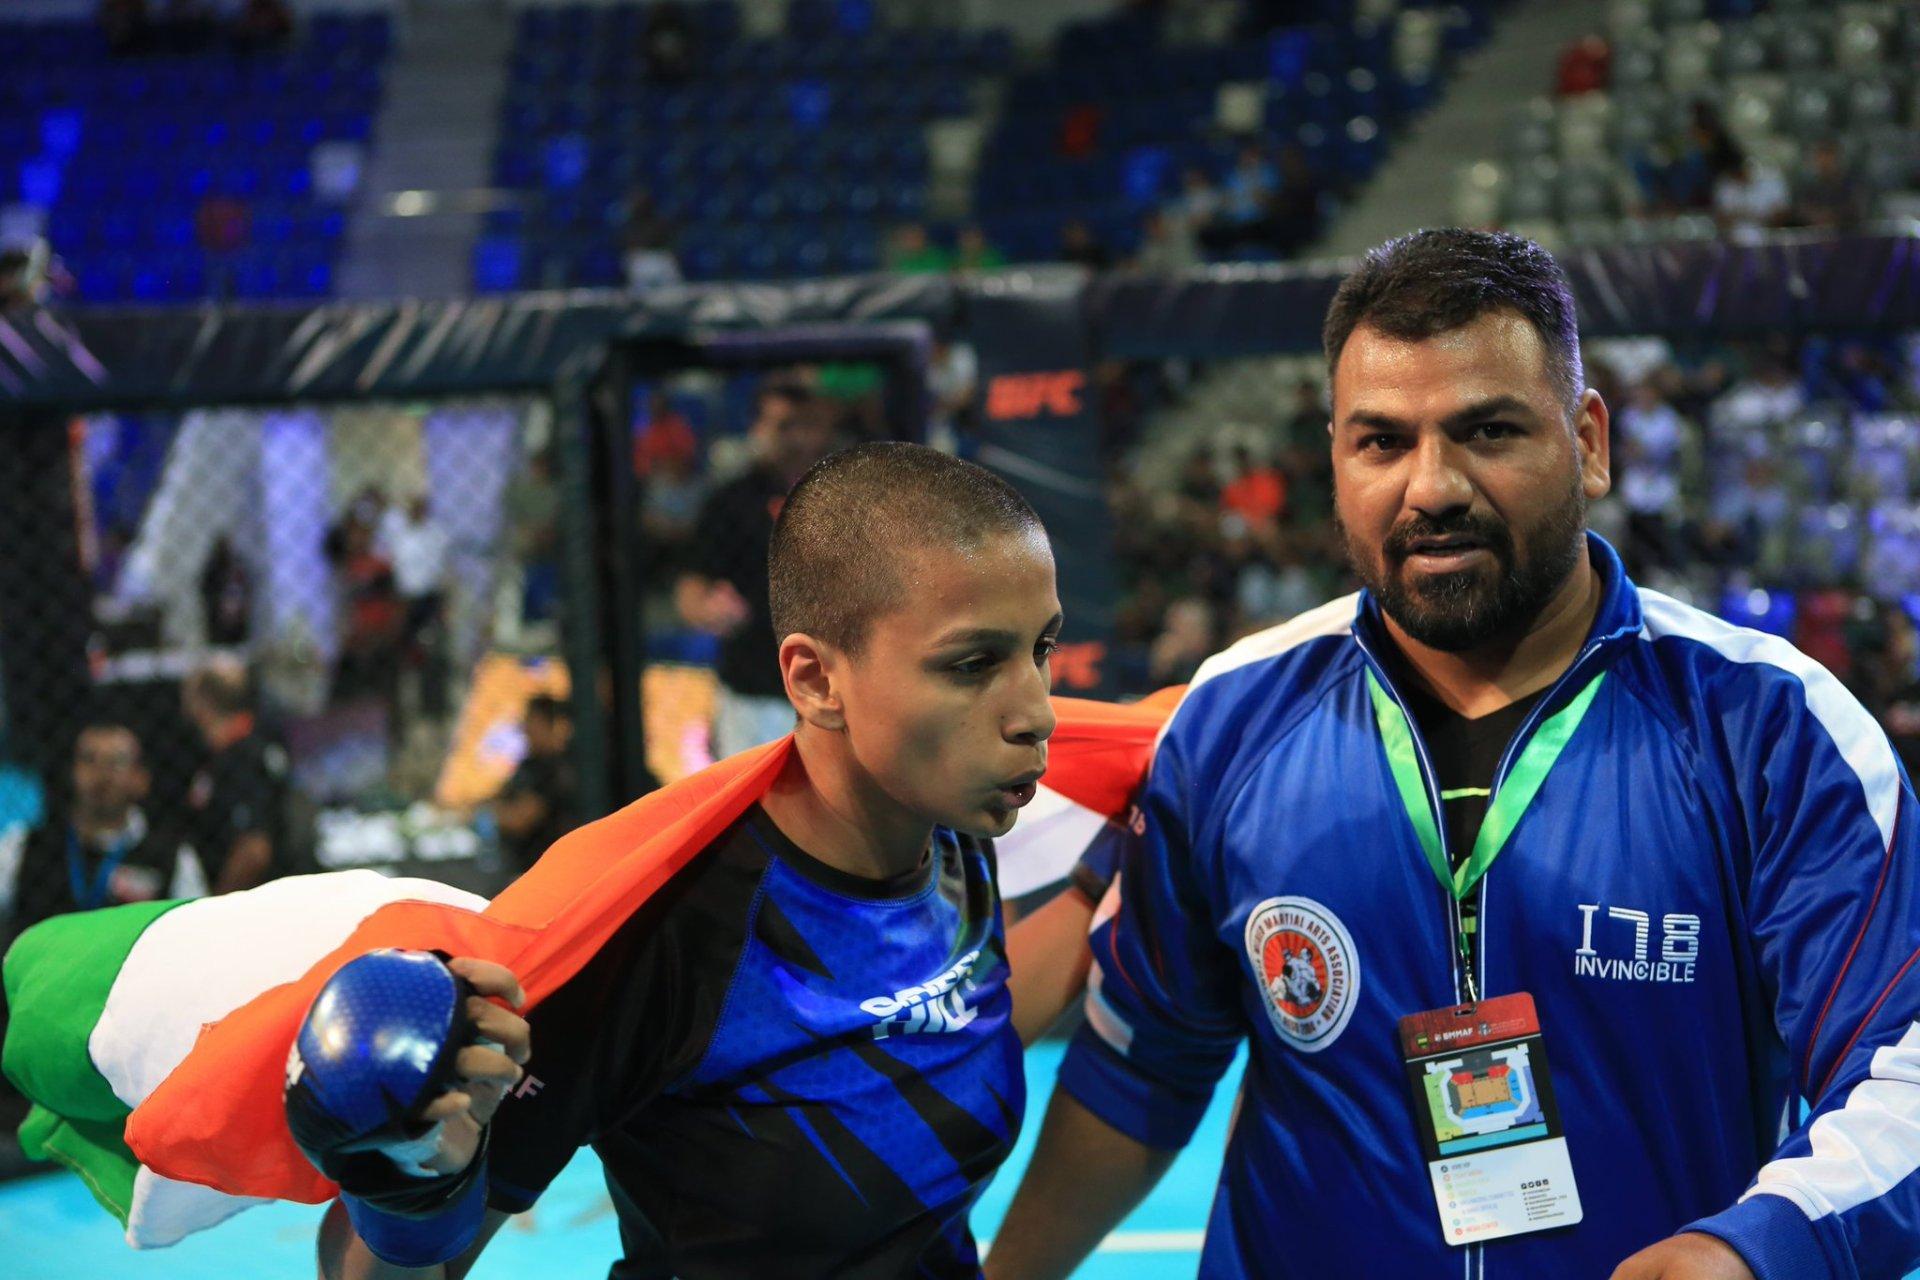 IMMAF World Championships Day 2 - Nishigandha, Shiva Raj advance -